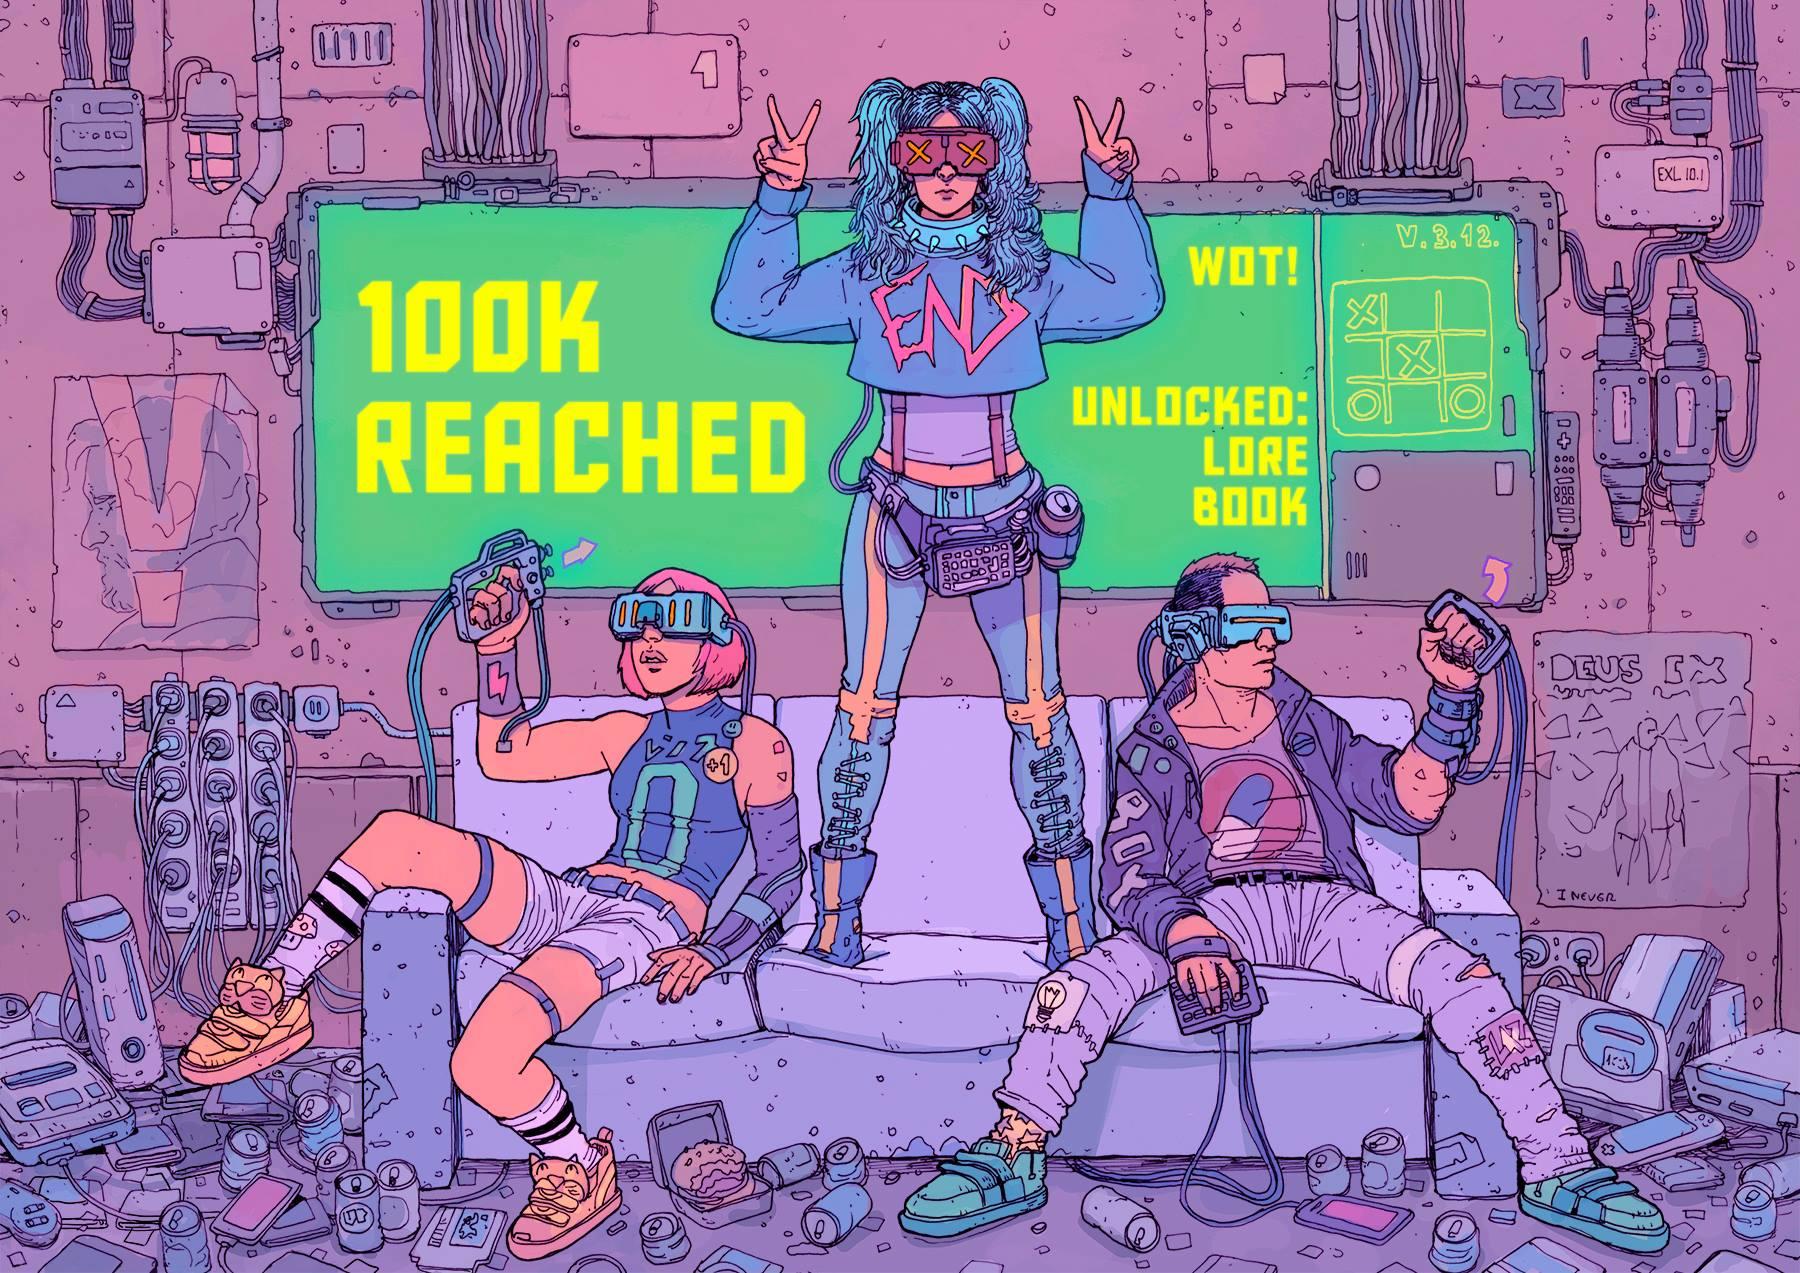 SCI Fi Cyberpunk Ilustração 09 - Josan Gonzalez